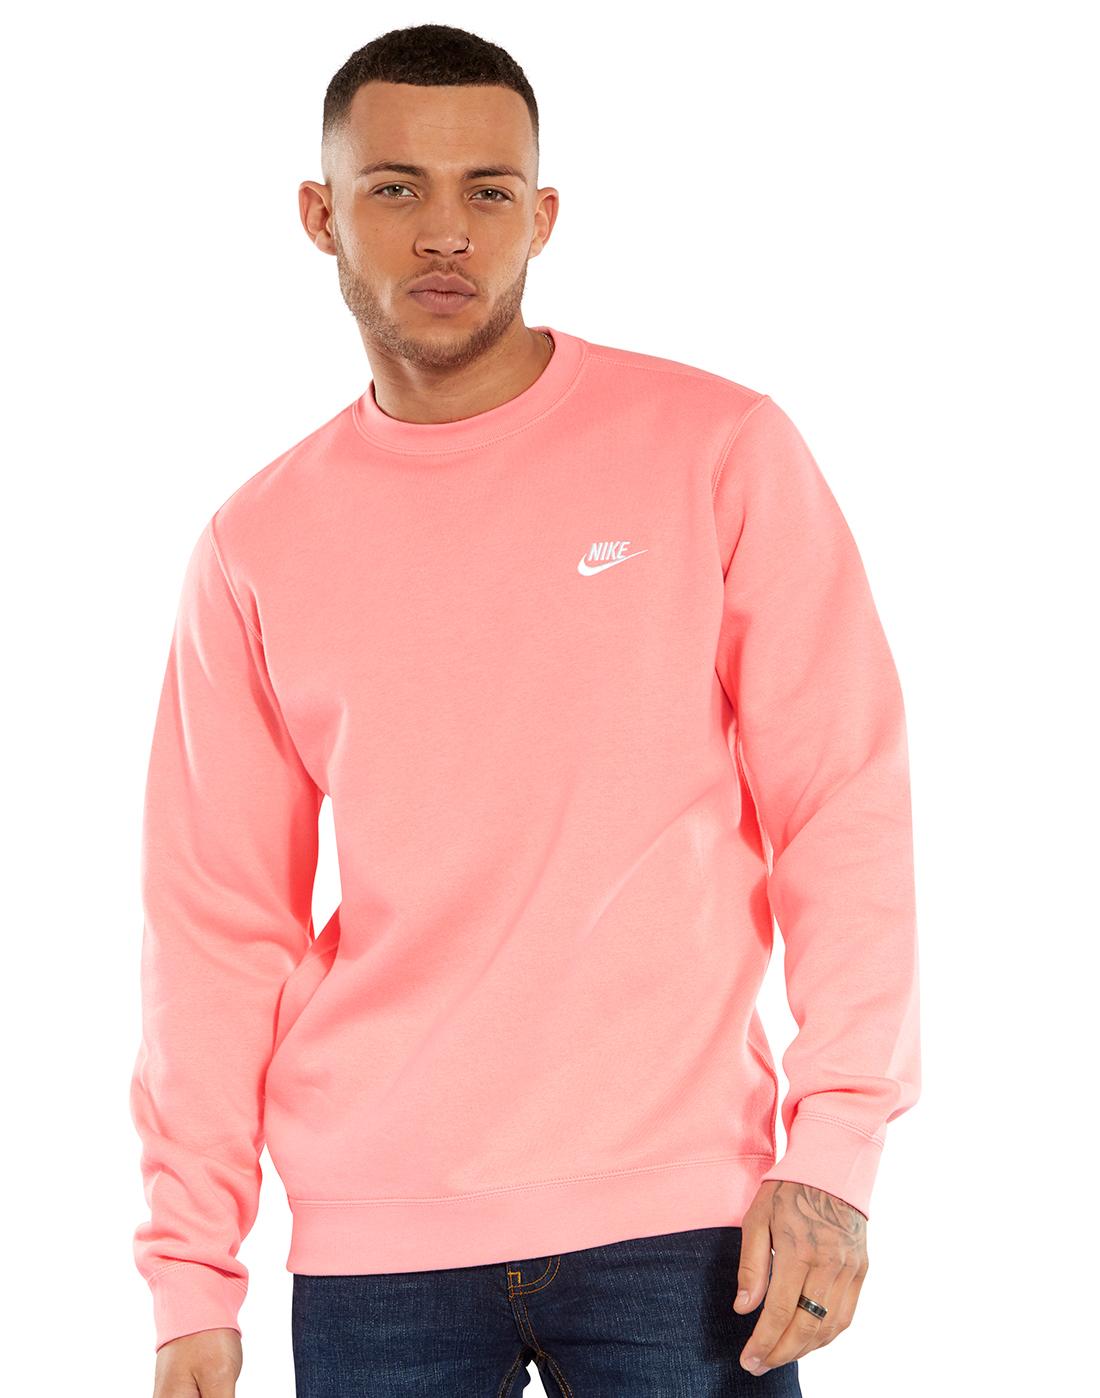 Continente Impotencia Cristo  Men's Pink Nike Crew Sweatshirt | Life Style Sports